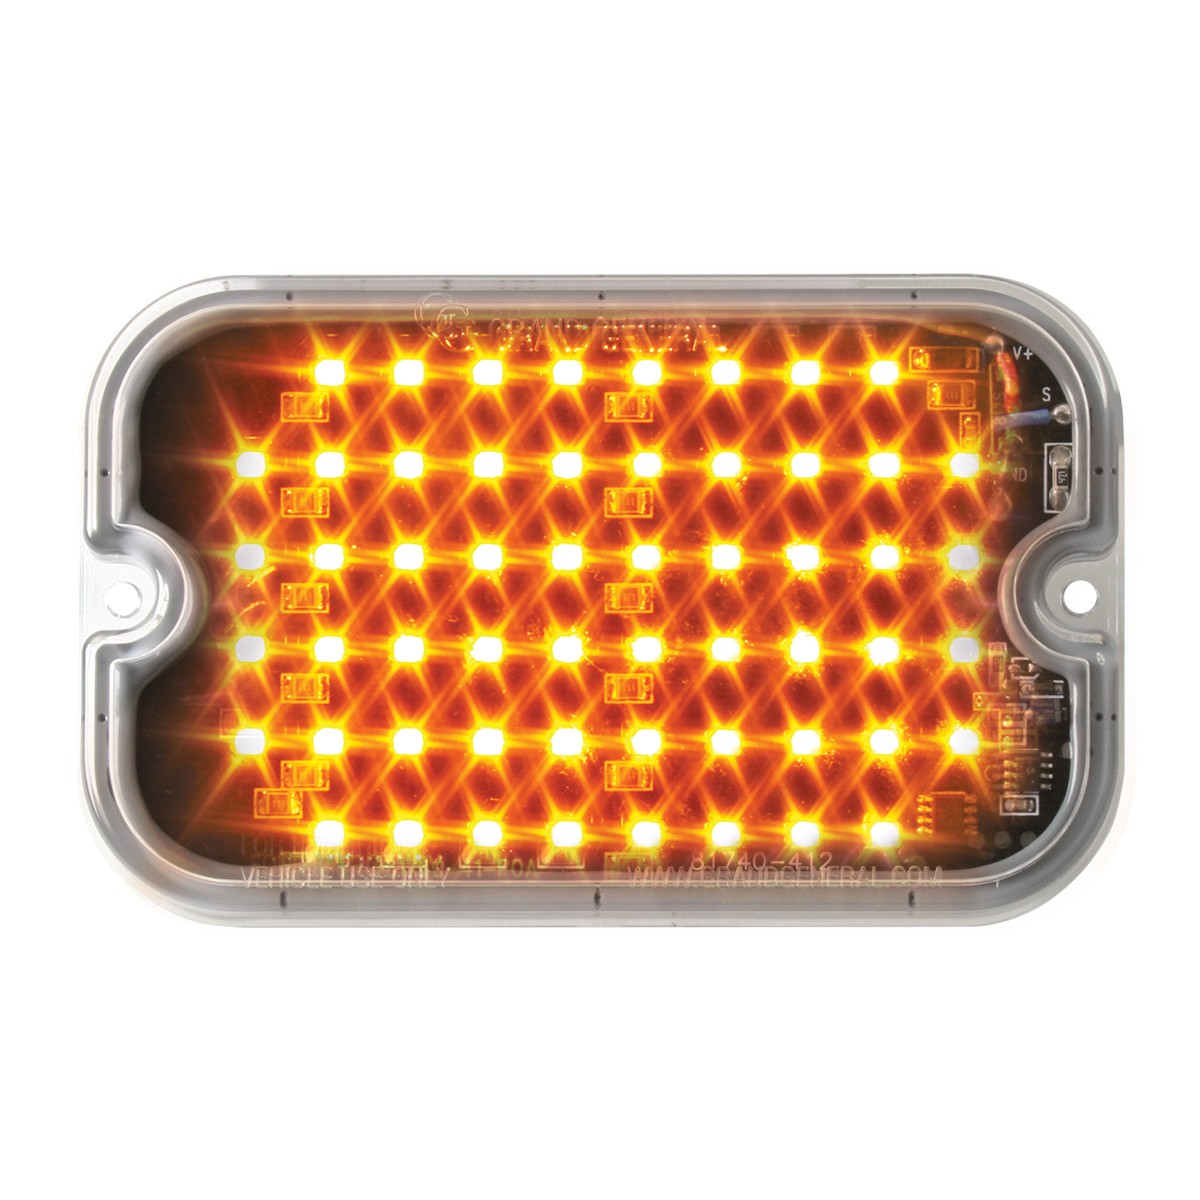 81740 Amber/Clear Ultra Thin Large Rectangular Strobe LED Light